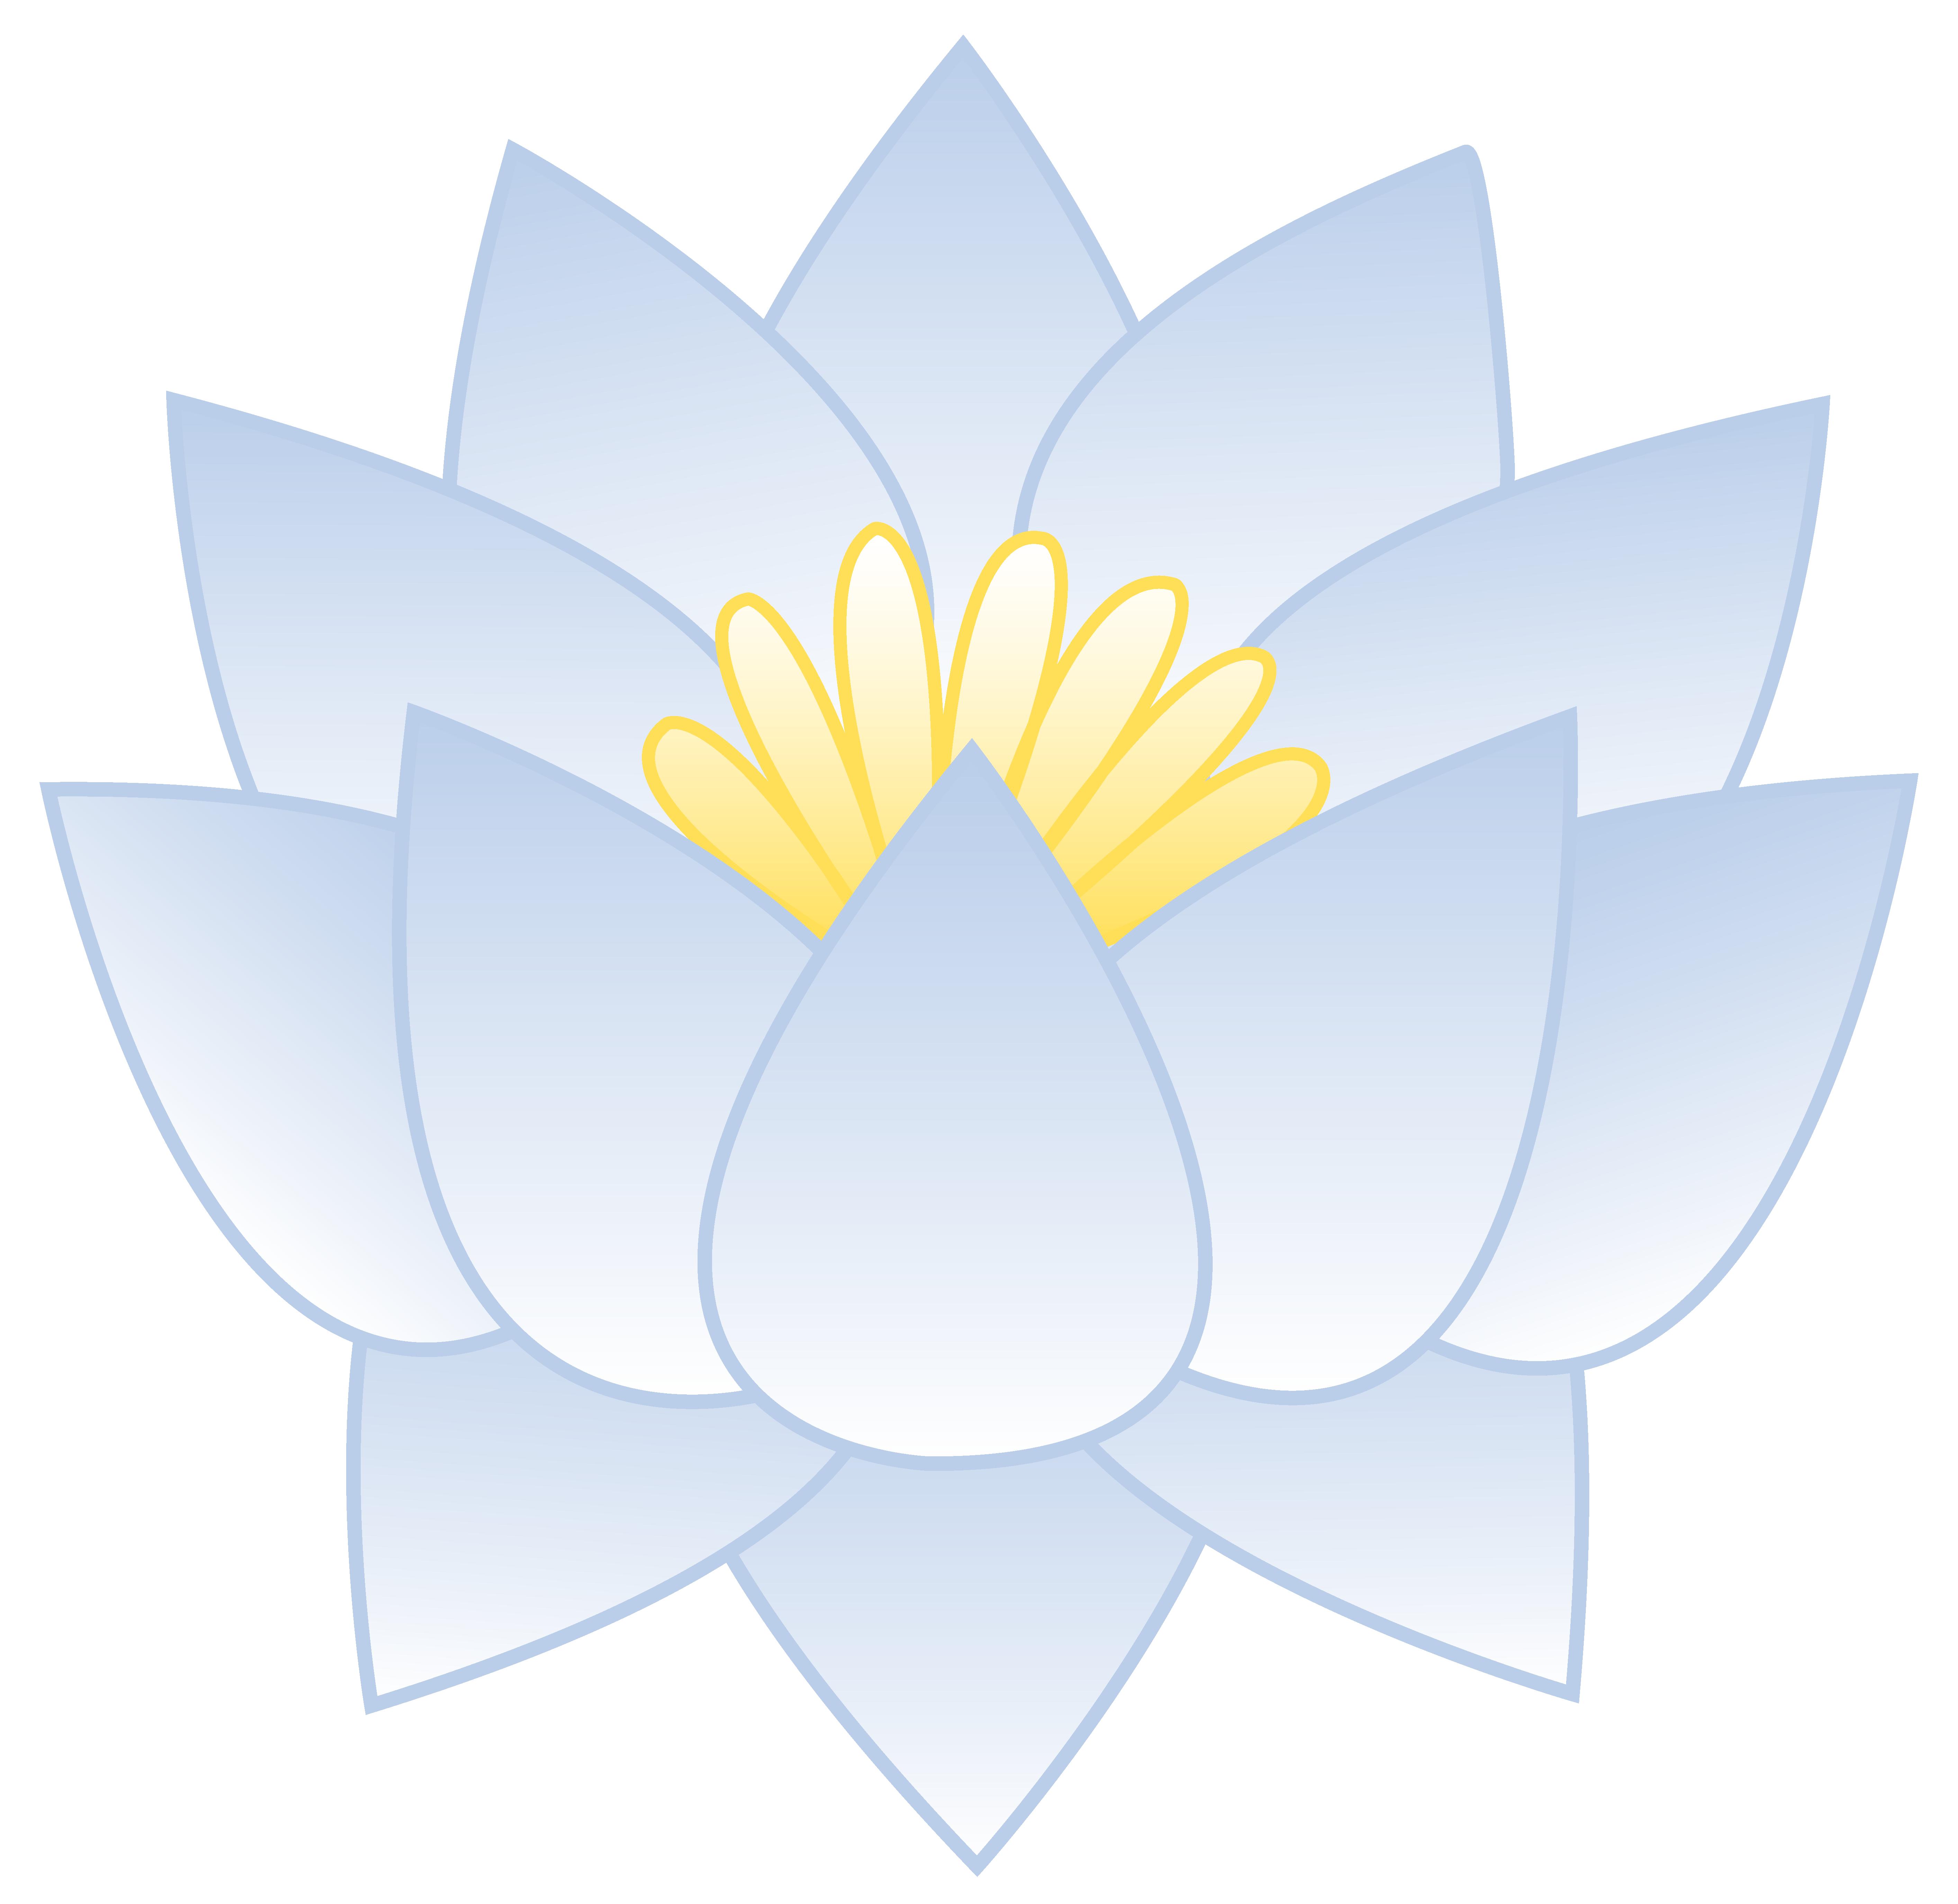 Free clip art of a pretty bluish white lotus flower.